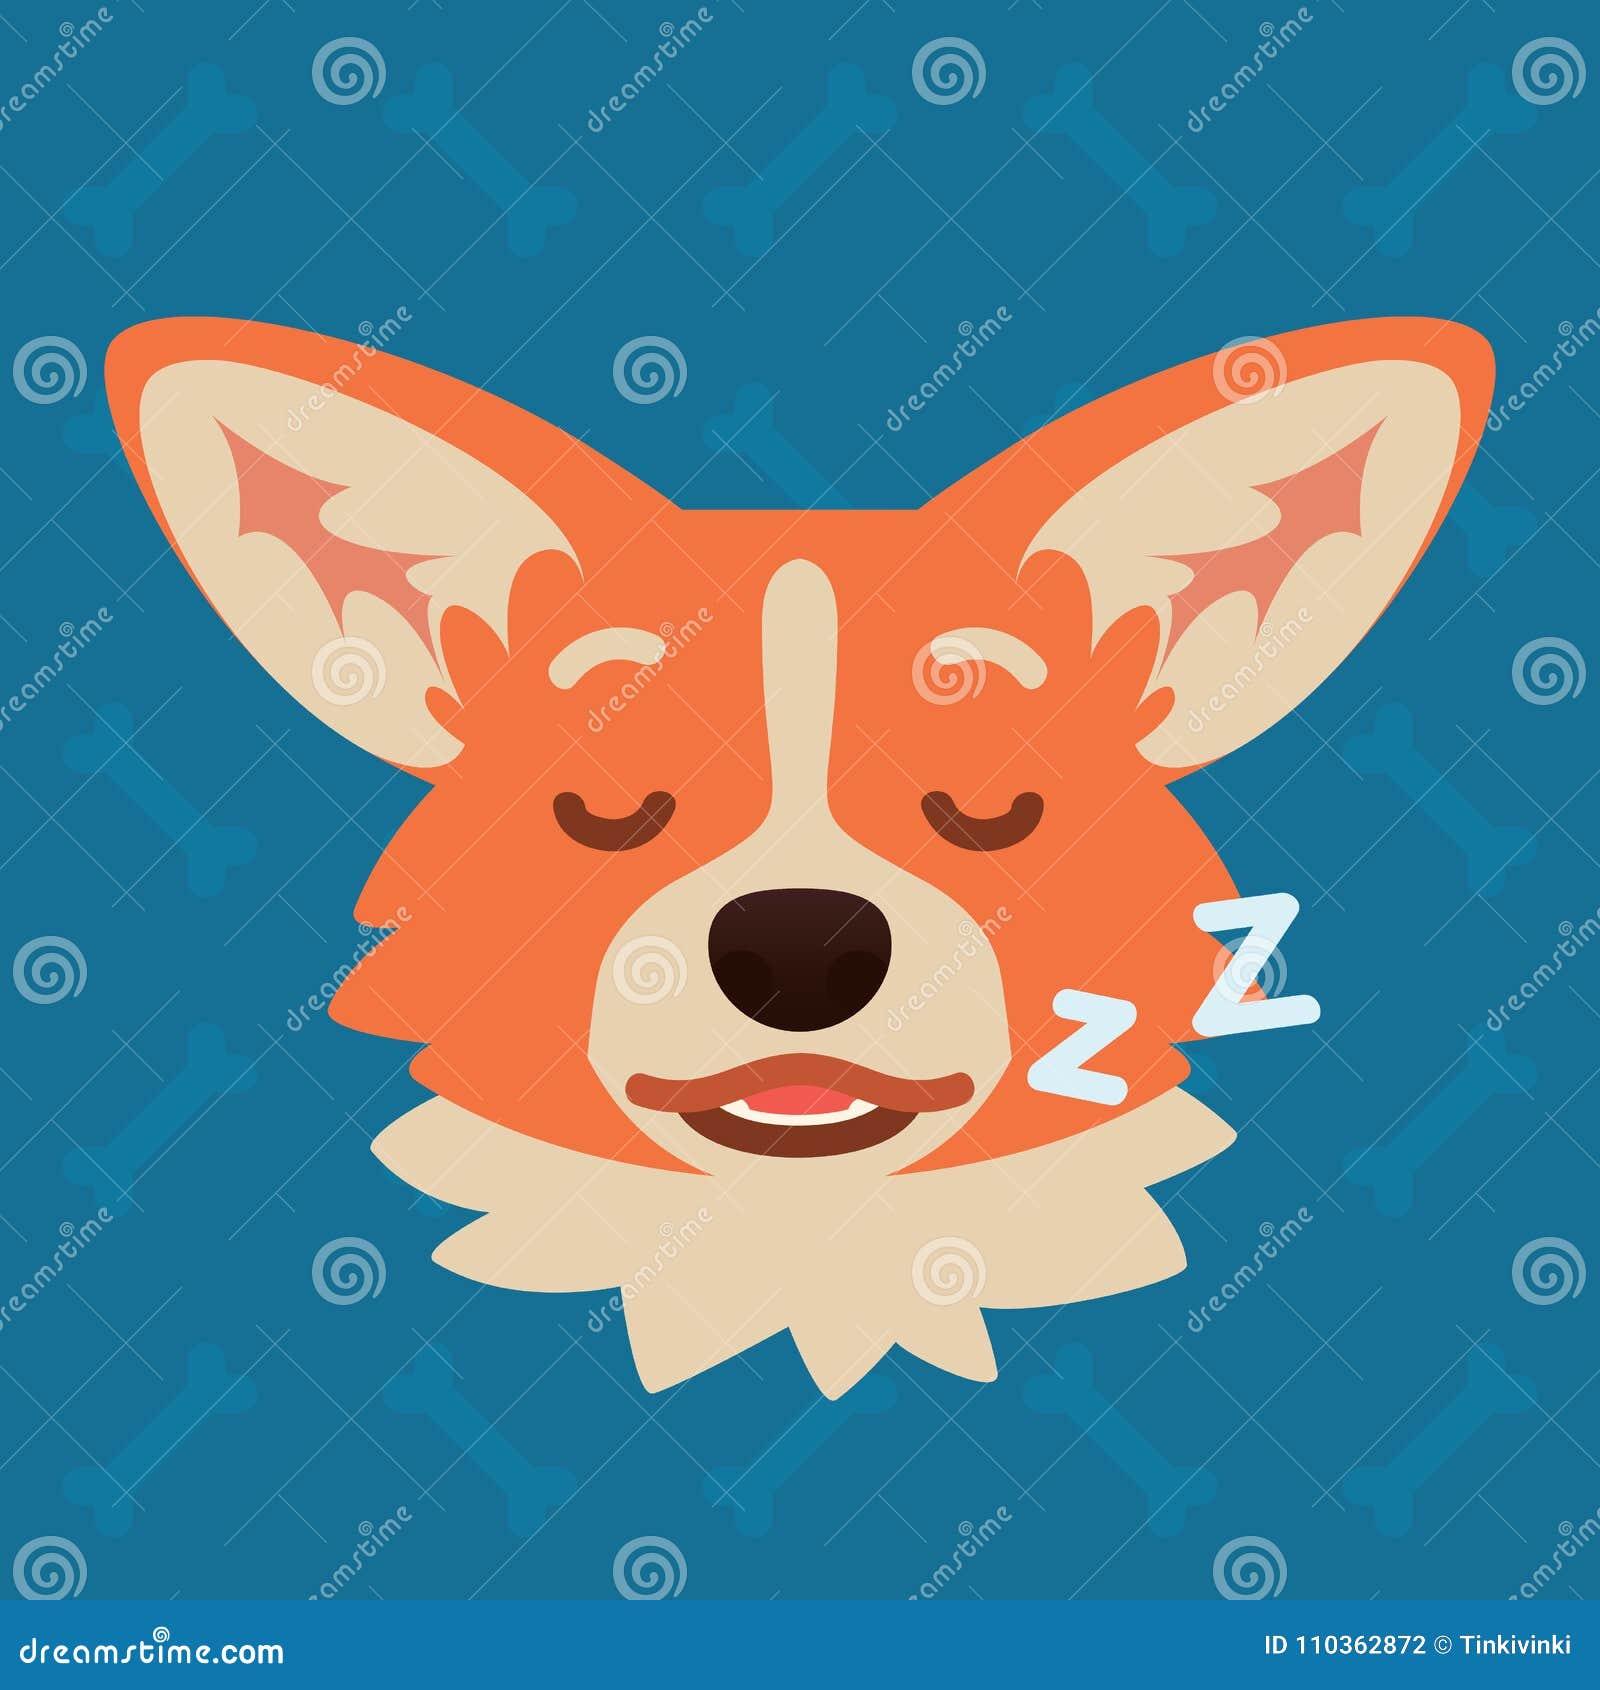 Corgi Dog Emotional Head  Vector Illustration Of Cute Dog In Flat